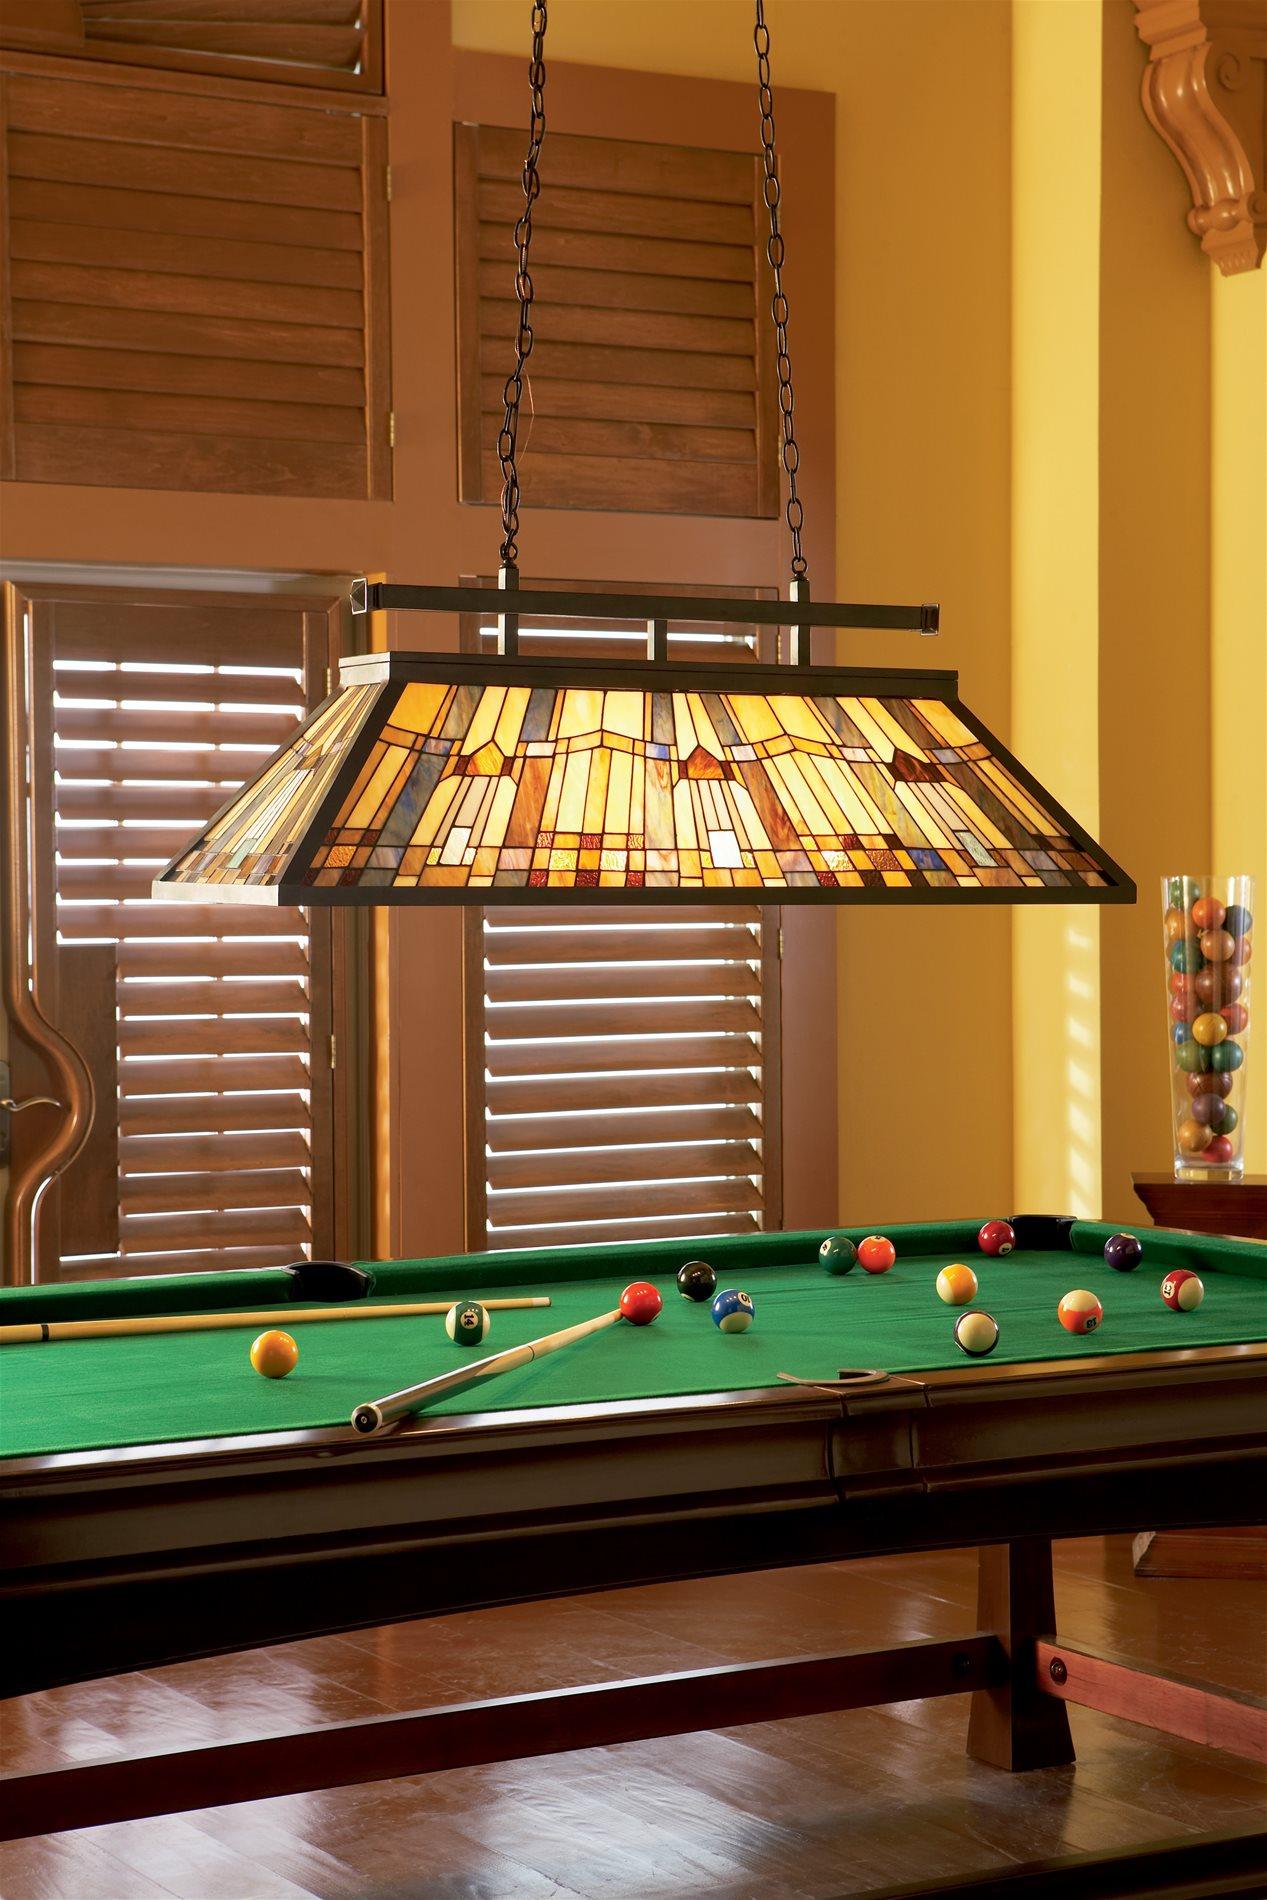 Pool Table Lights : Quoizel tfik va inglenook traditional tiffany kitchen